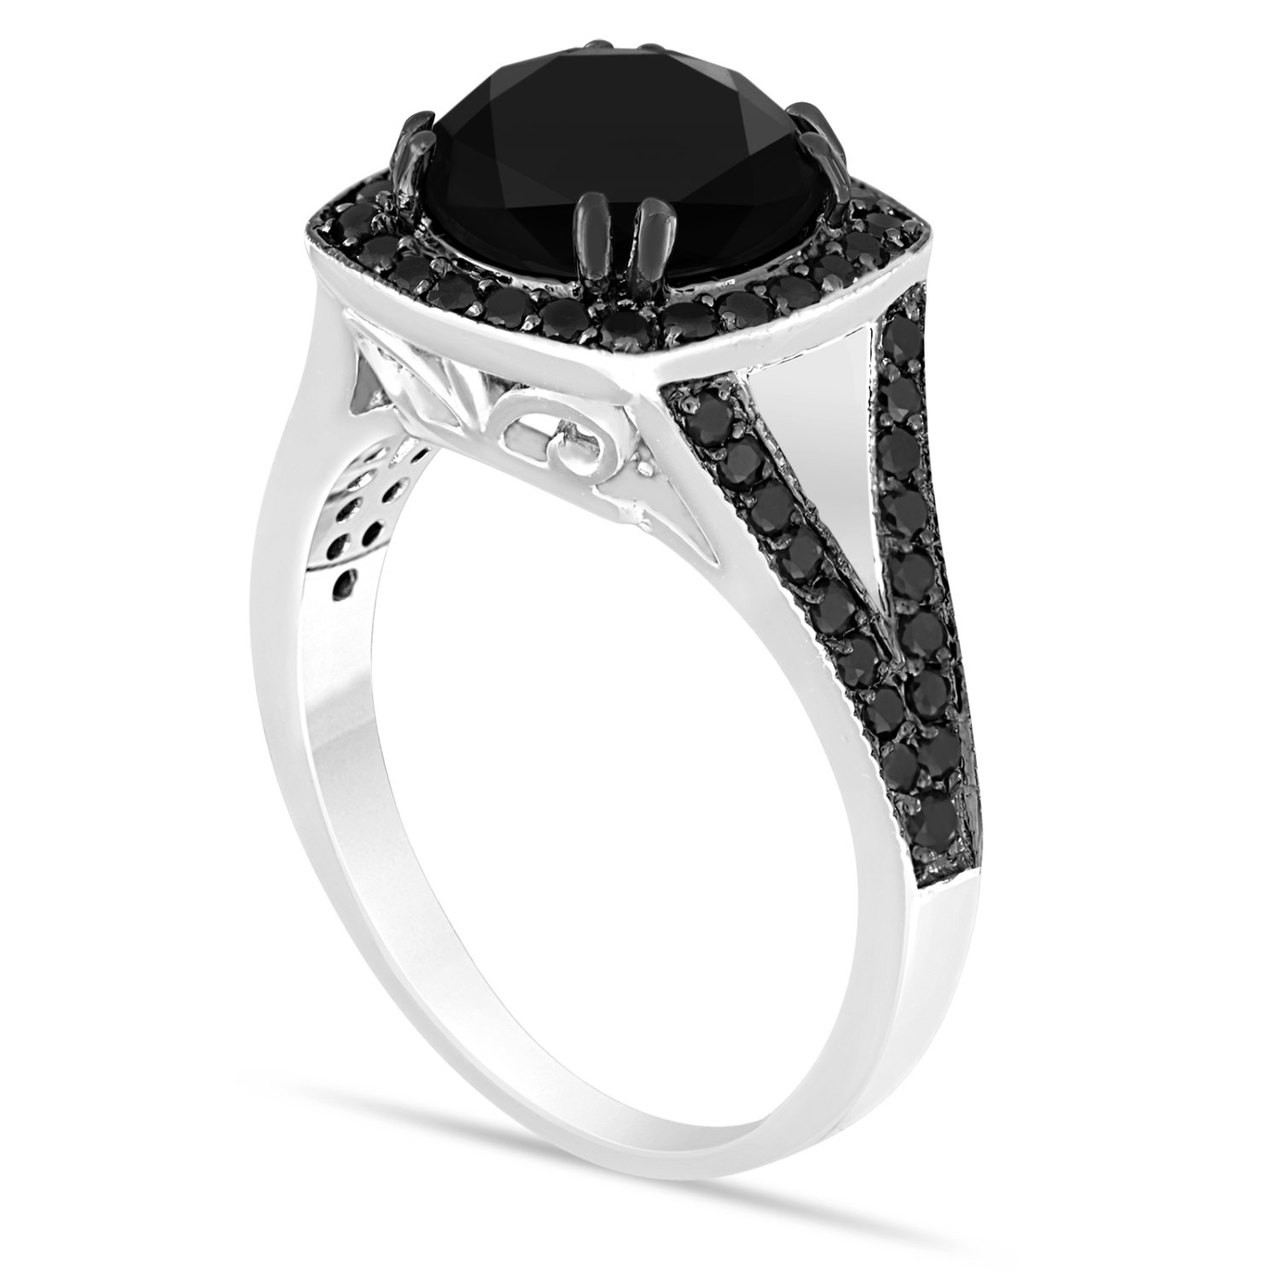 Antique Style 4 2mm Platinum Men S Wedding Band With: Platinum Huge Fancy Black Diamond Engagement Ring 4.12